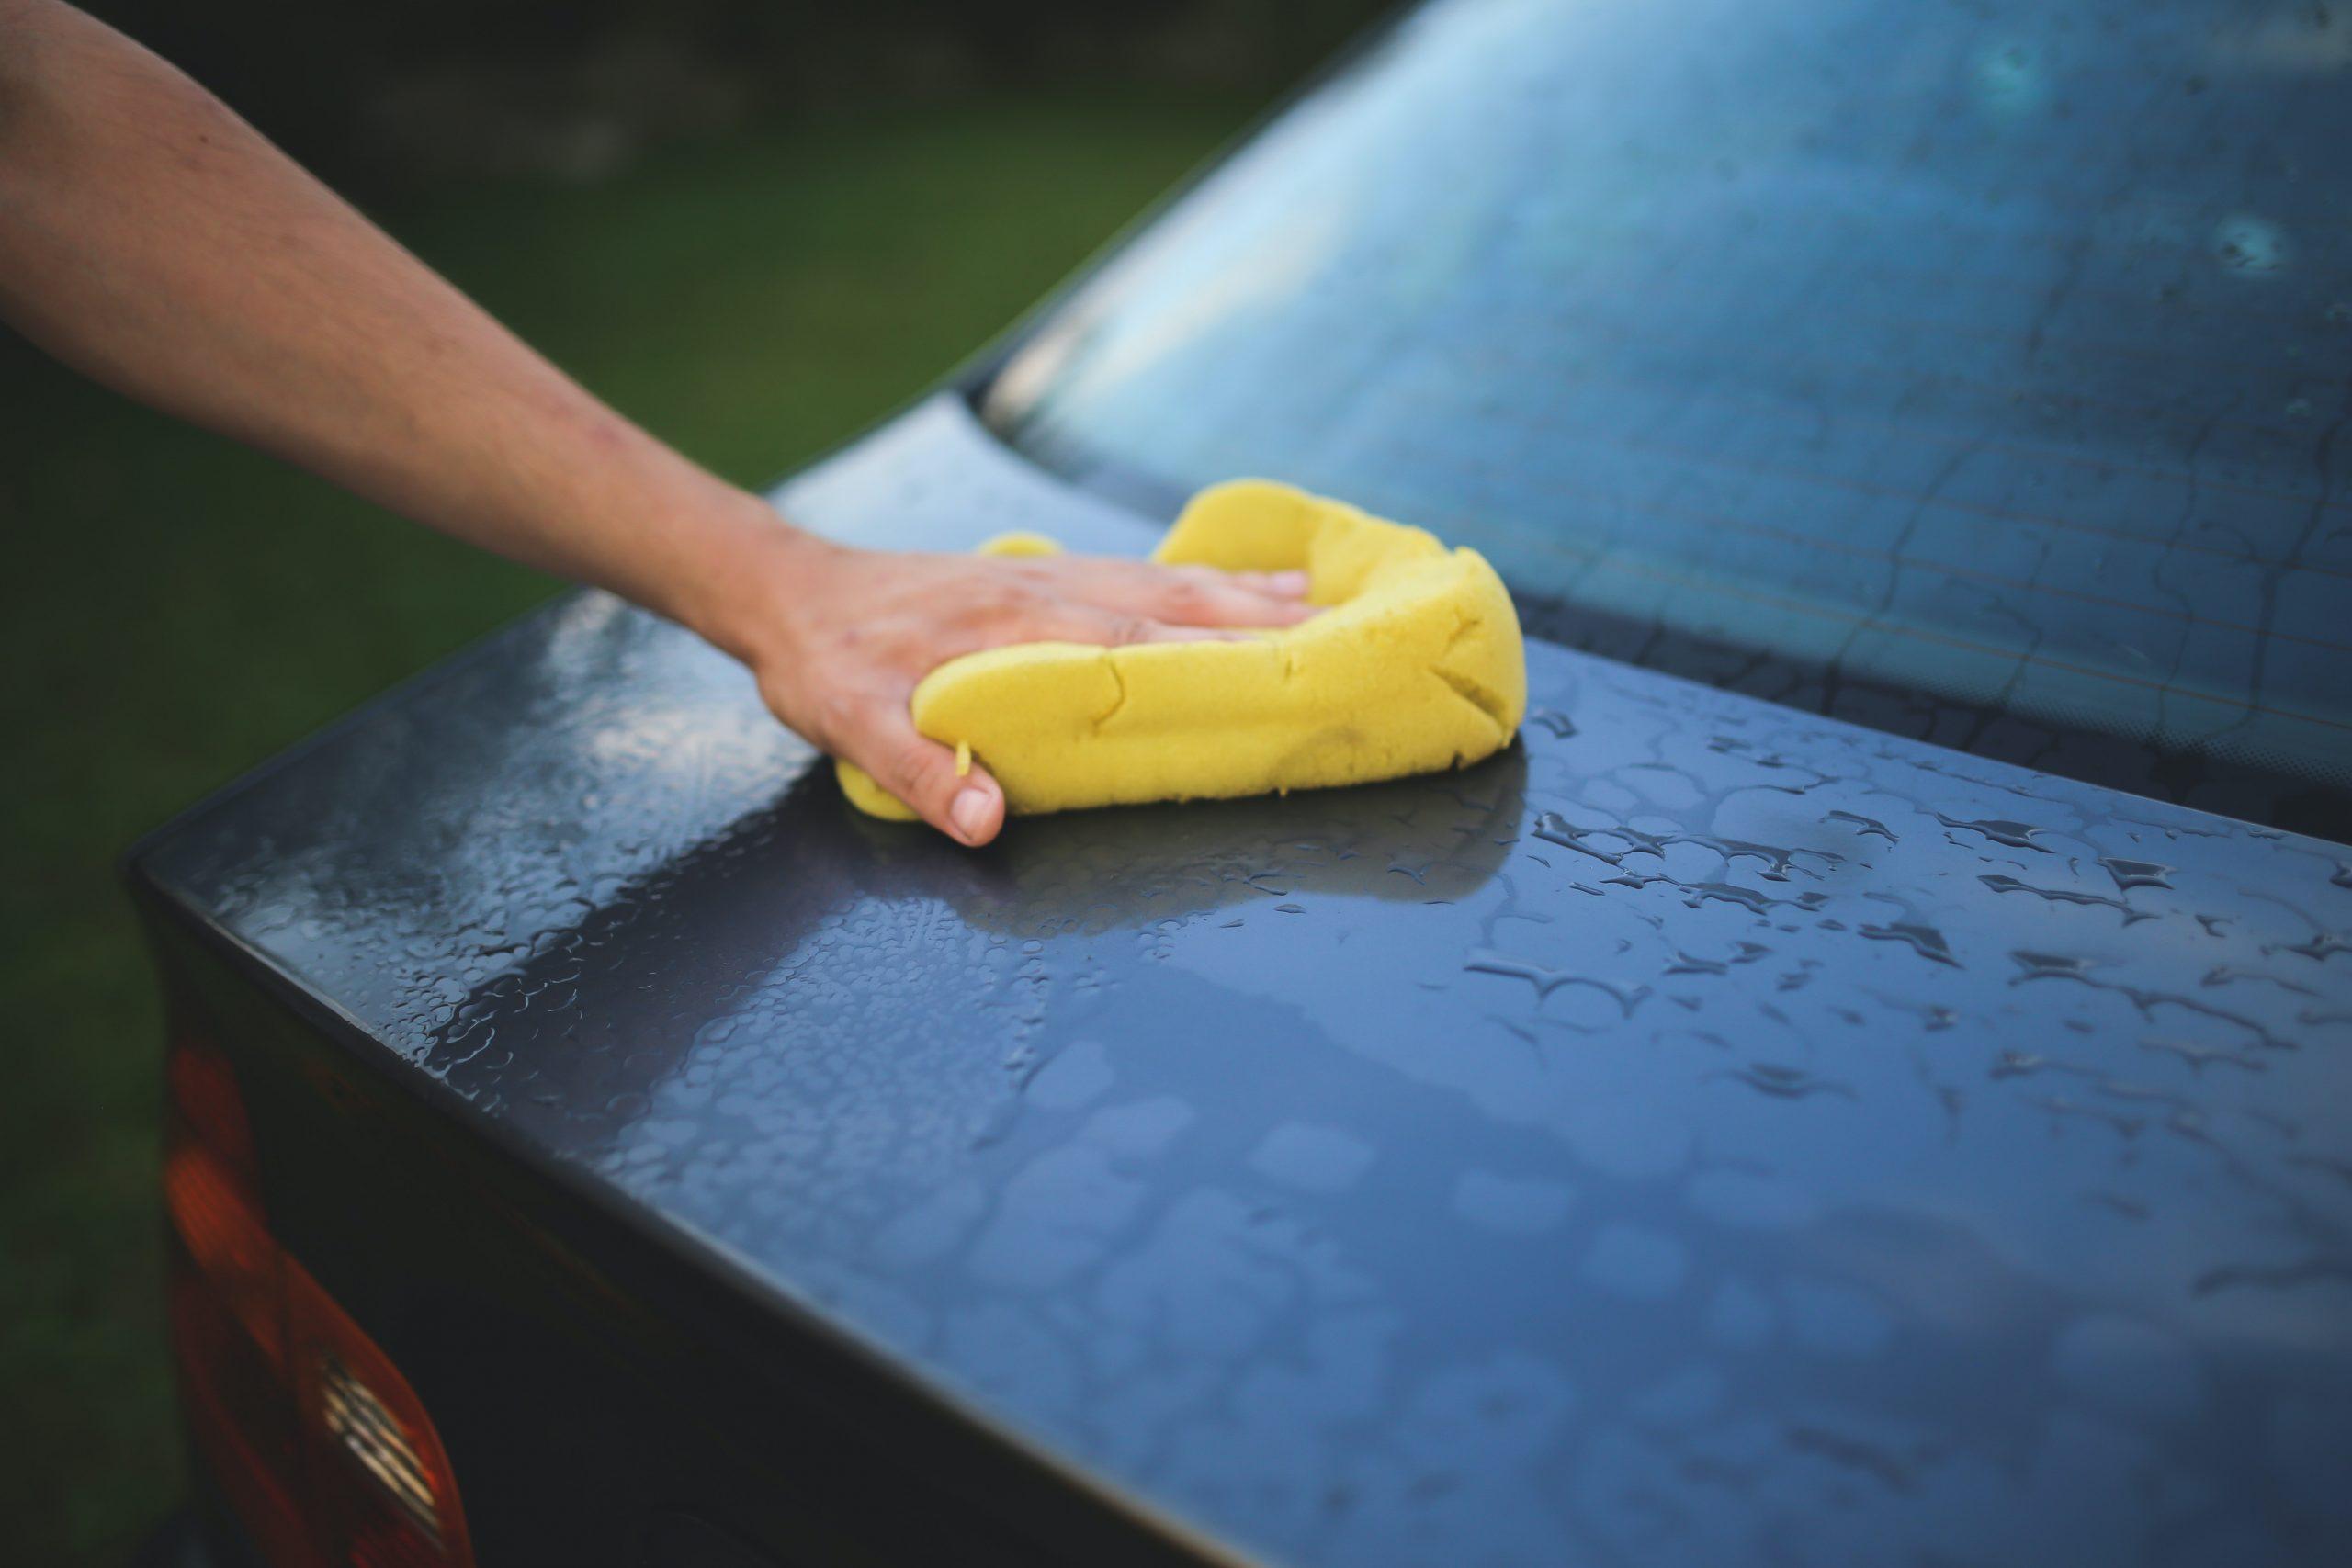 webuyyourcars 墨尔本 - 汽车清洁